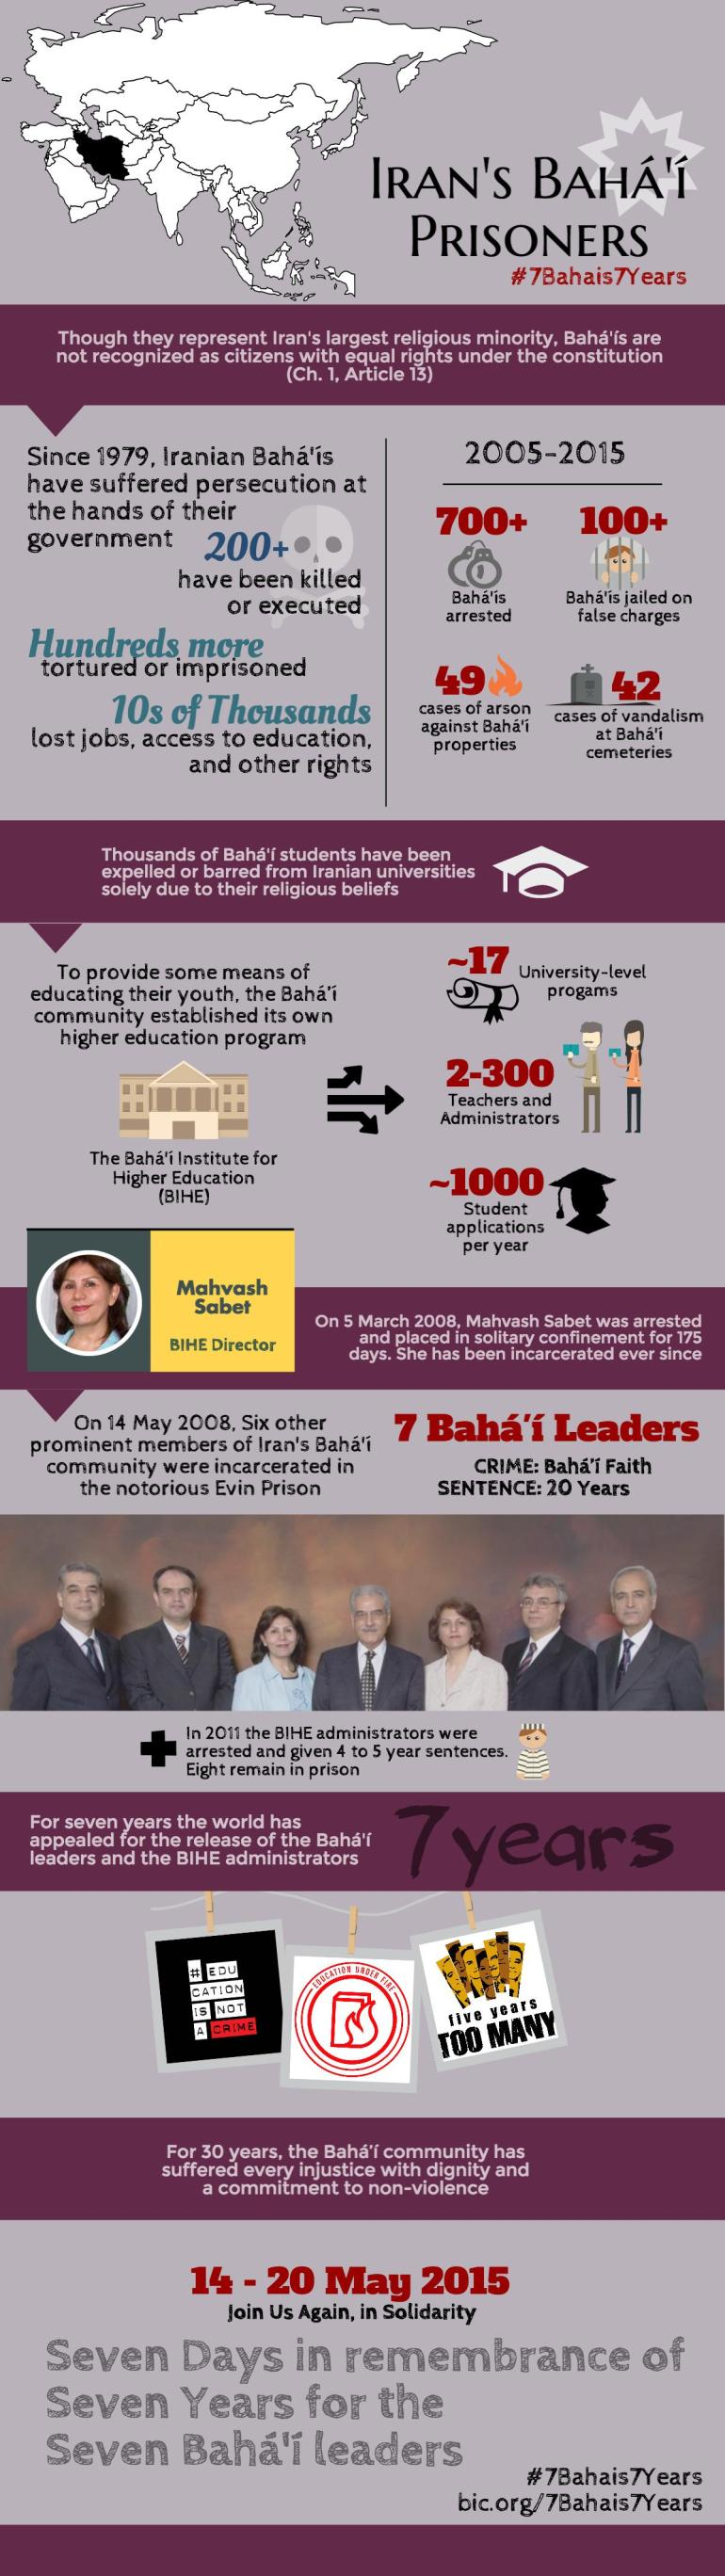 Baha'i Situation Comprehensive